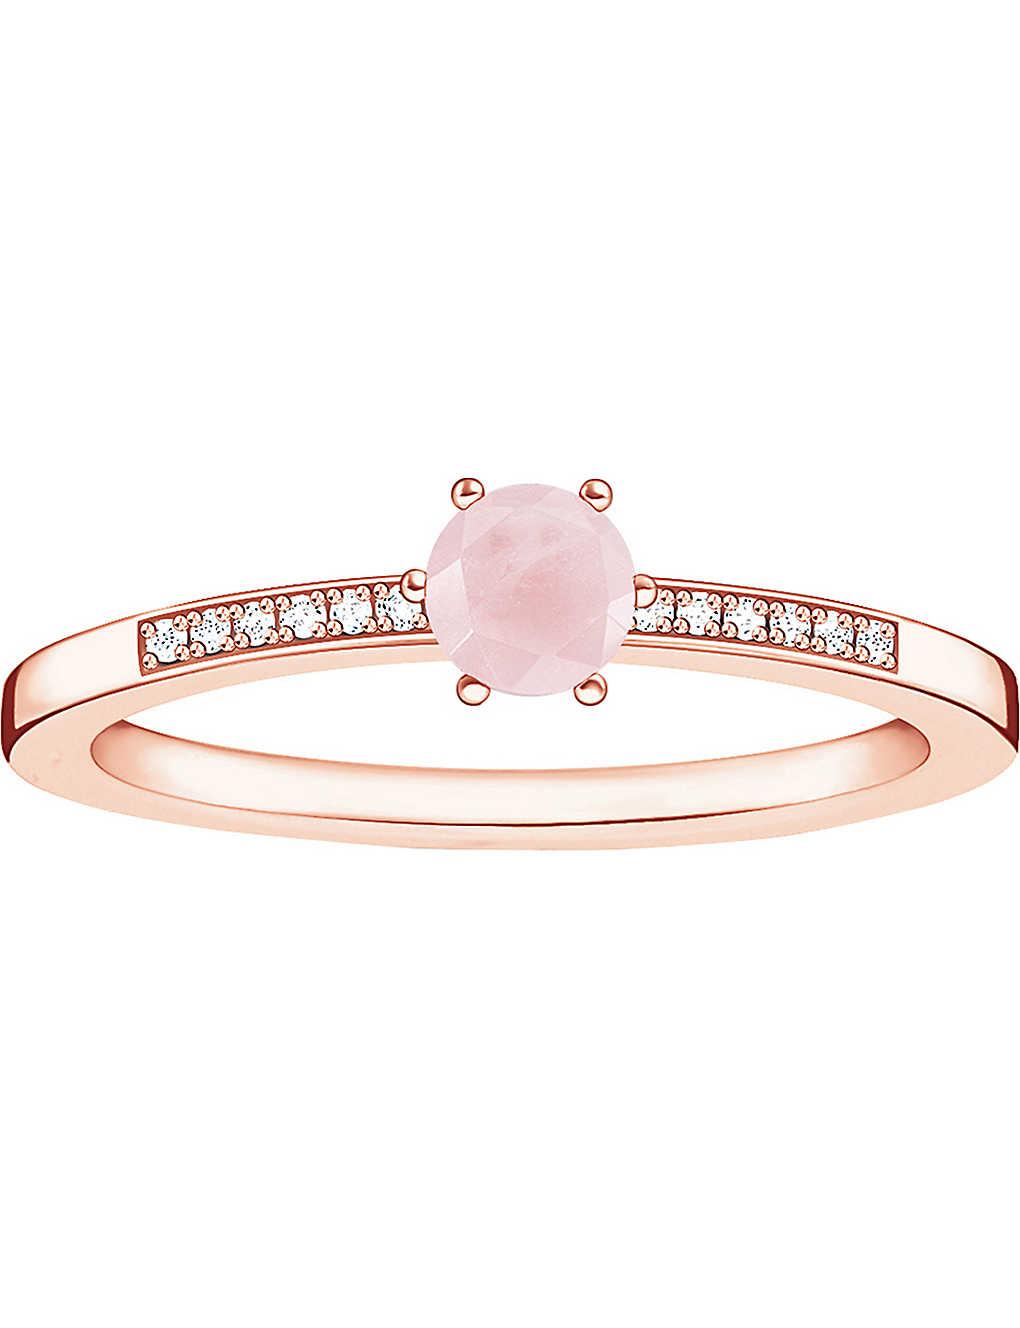 539425c4b THOMAS SABO Glam & Soul 18ct rose gold-plated, rose quartz and diamond ring